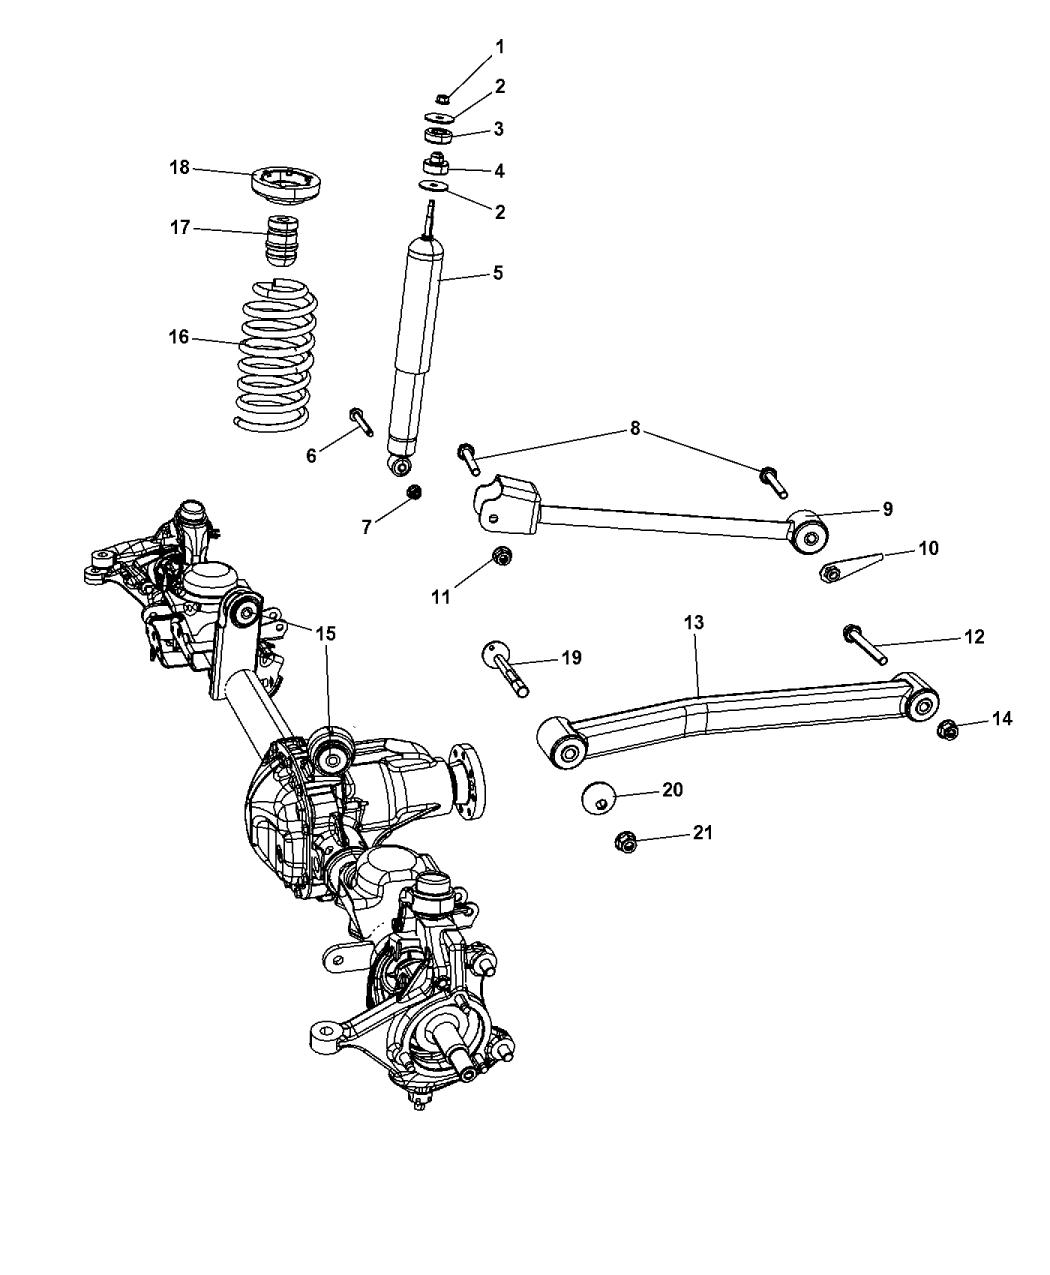 68047812ad Genuine Mopar Absbr Kit Suspension